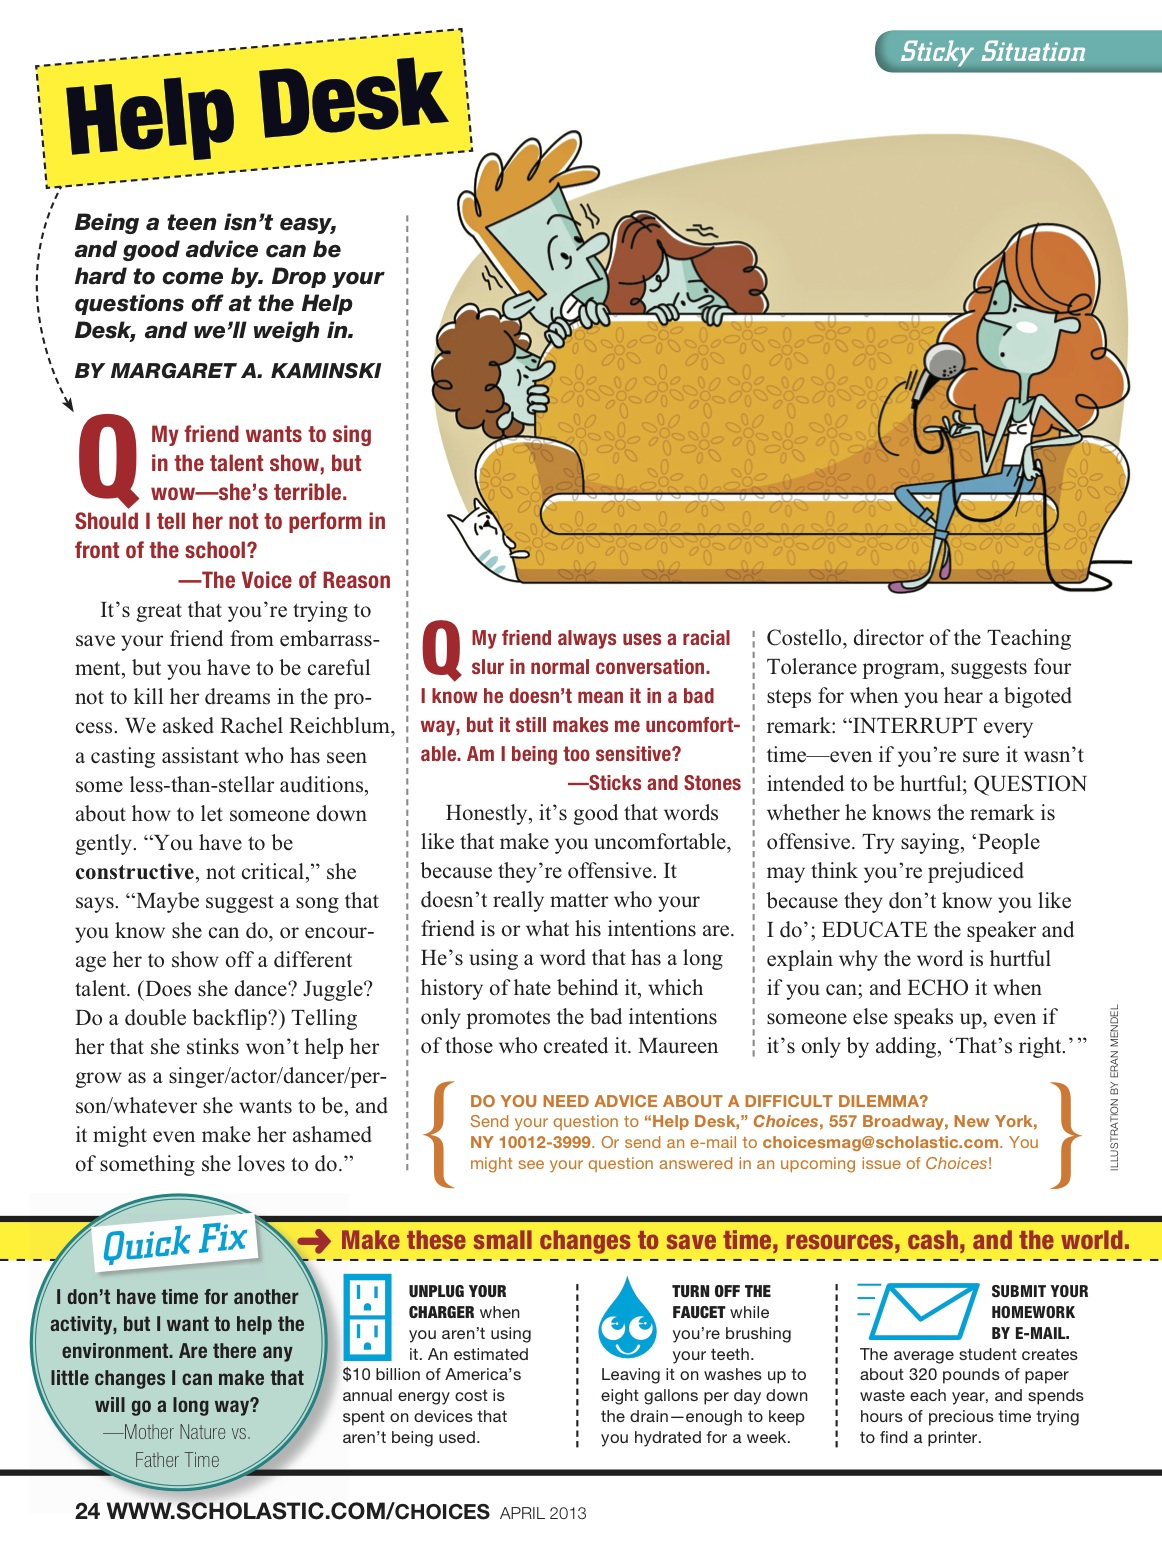 Choices Magazine